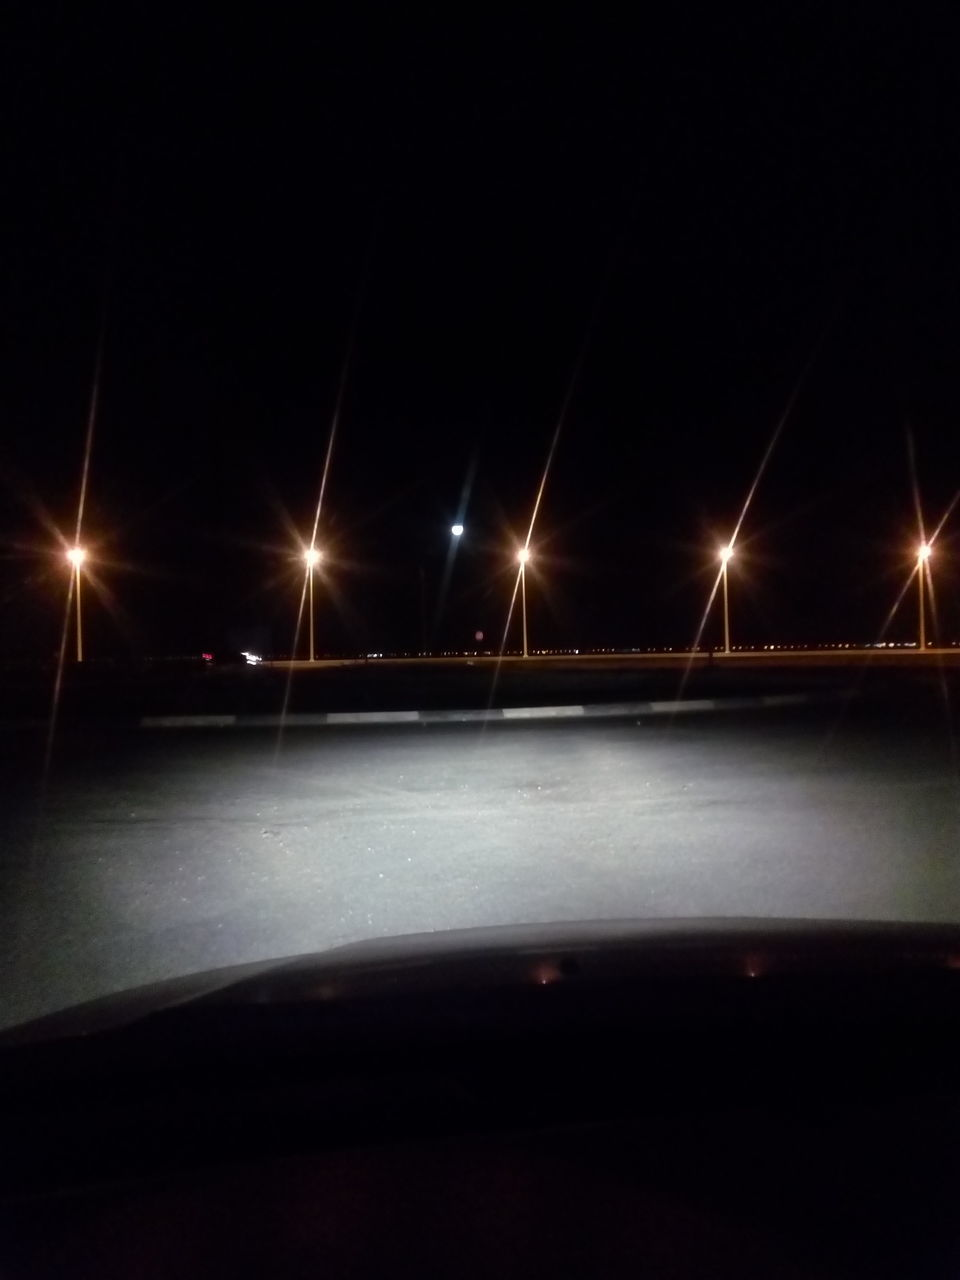 illuminated, night, transportation, no people, street light, spotlight, outdoors, sky